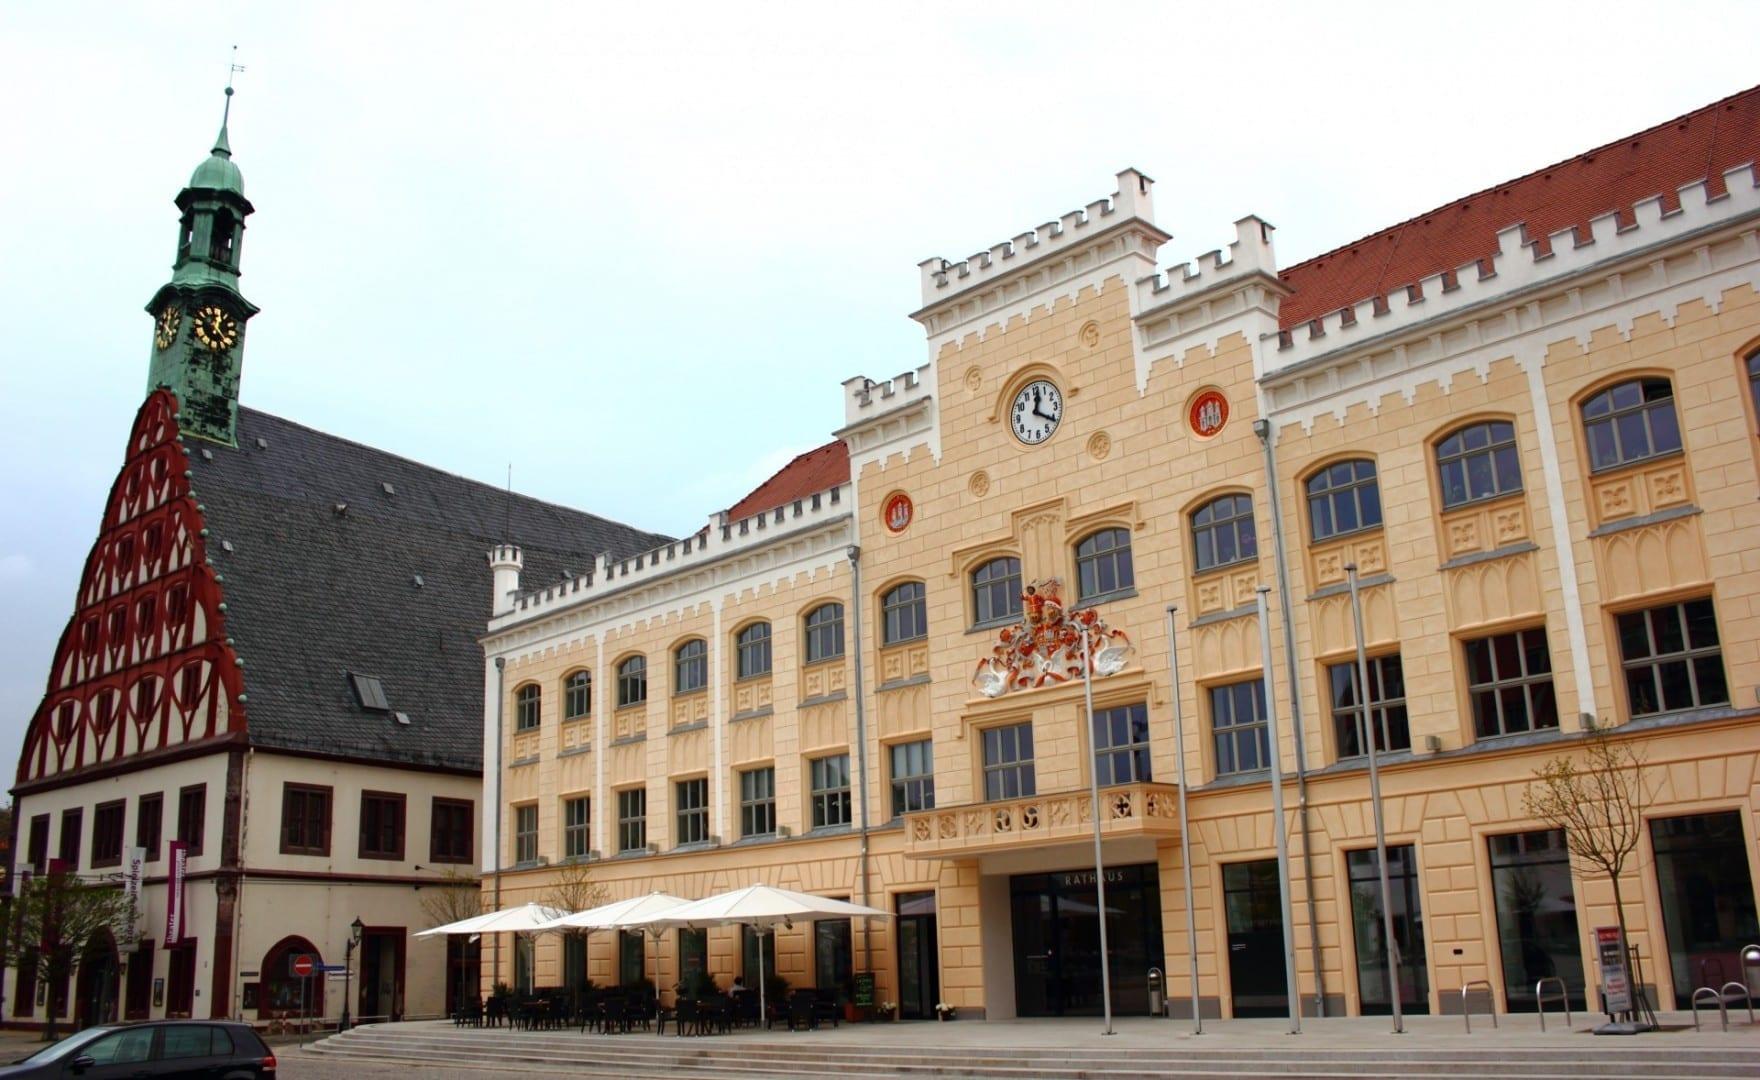 Ayuntamiento y Gewandhaus Zwickau Alemania